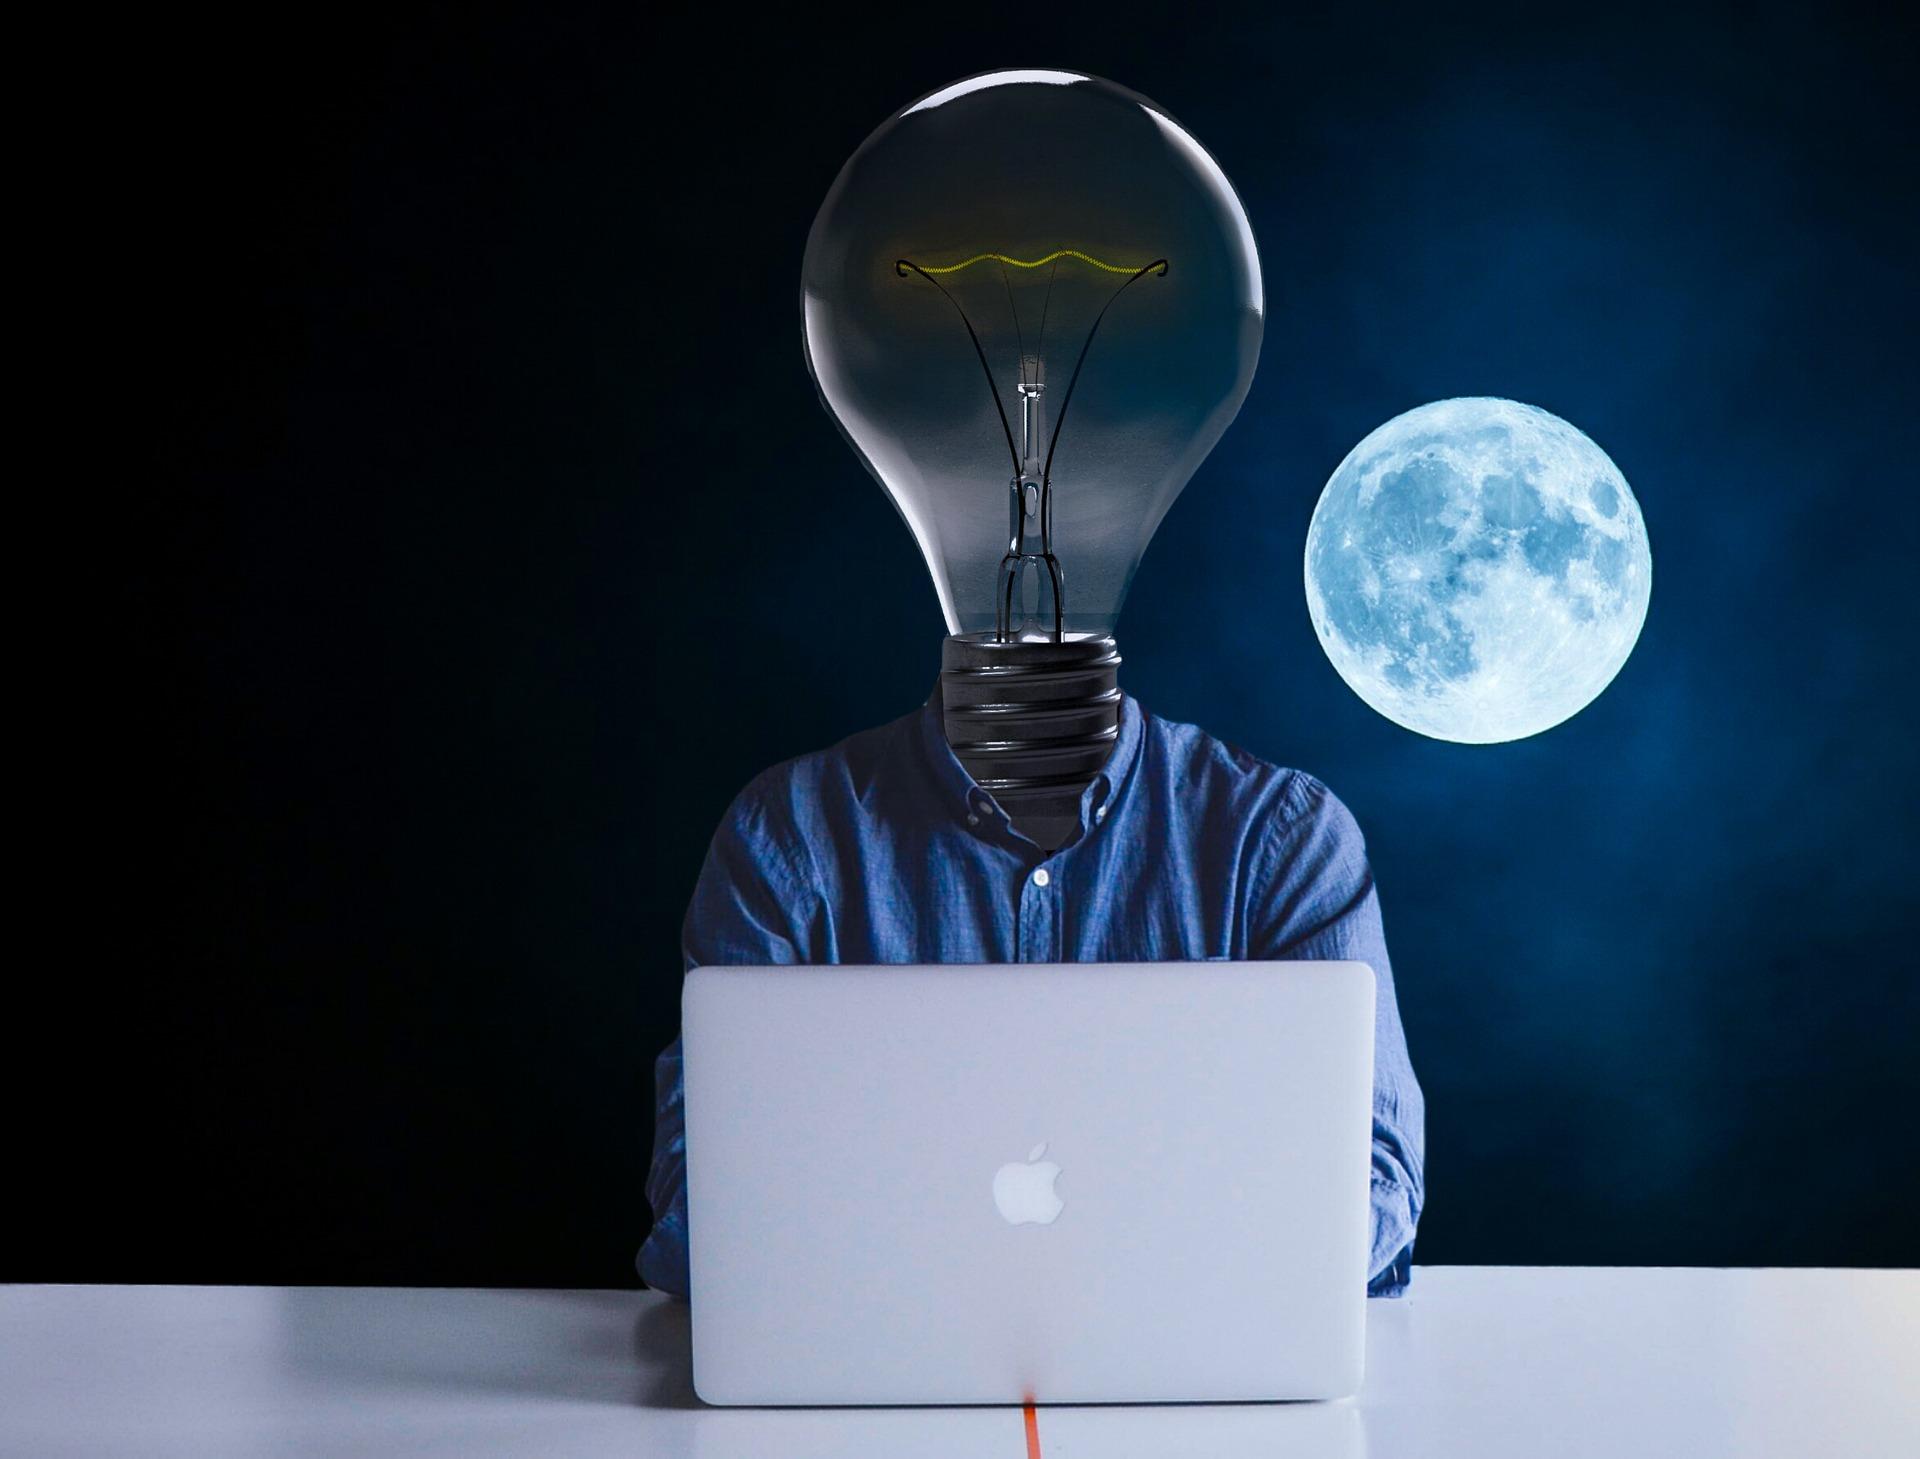 Creativity at Night